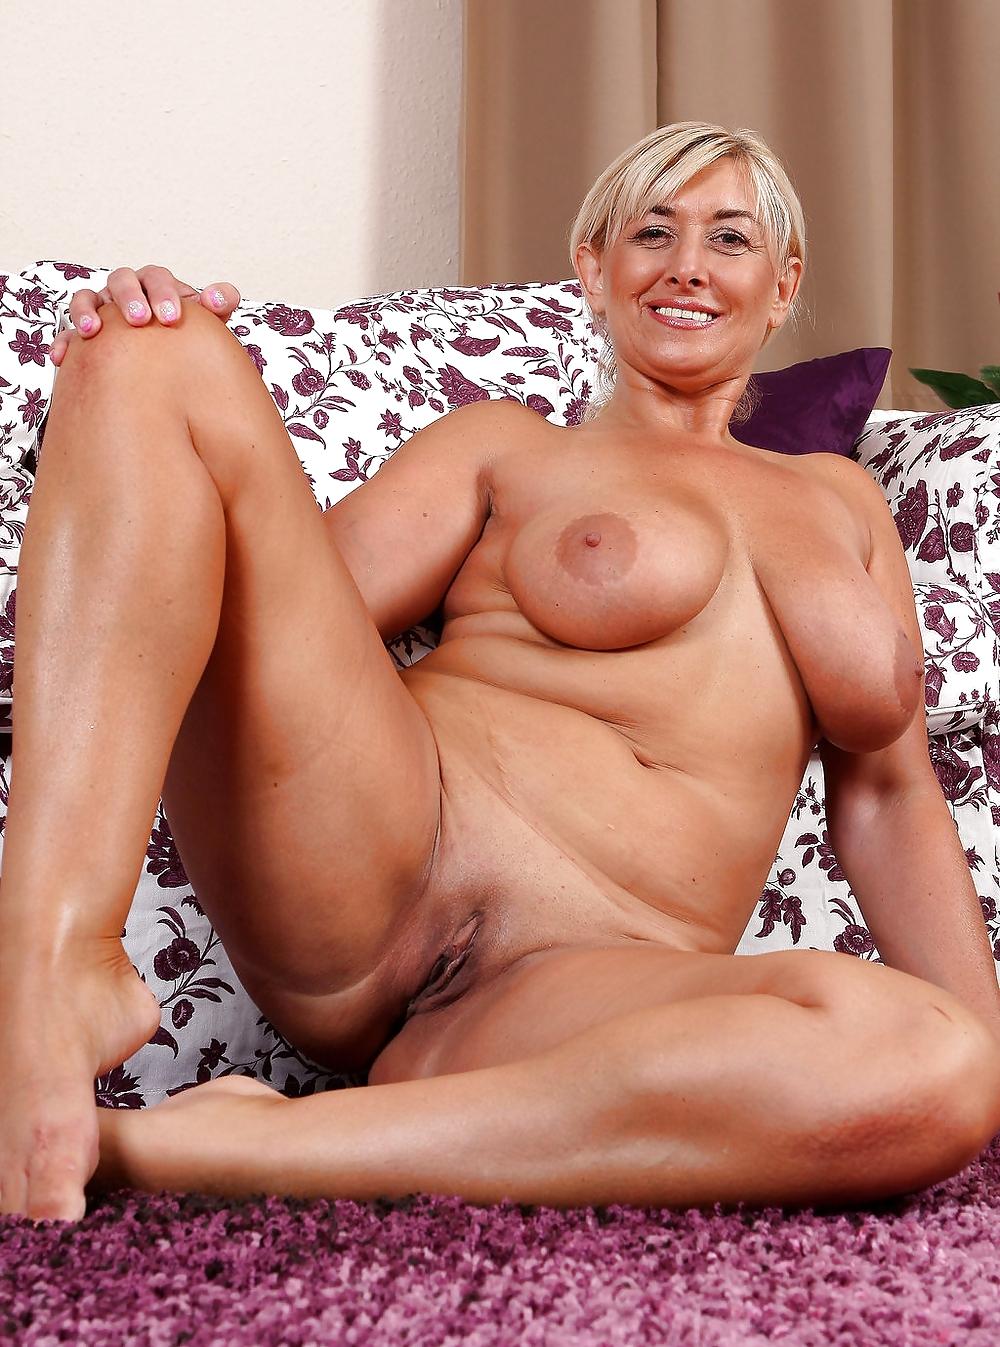 Hungarian milf mature women in nude